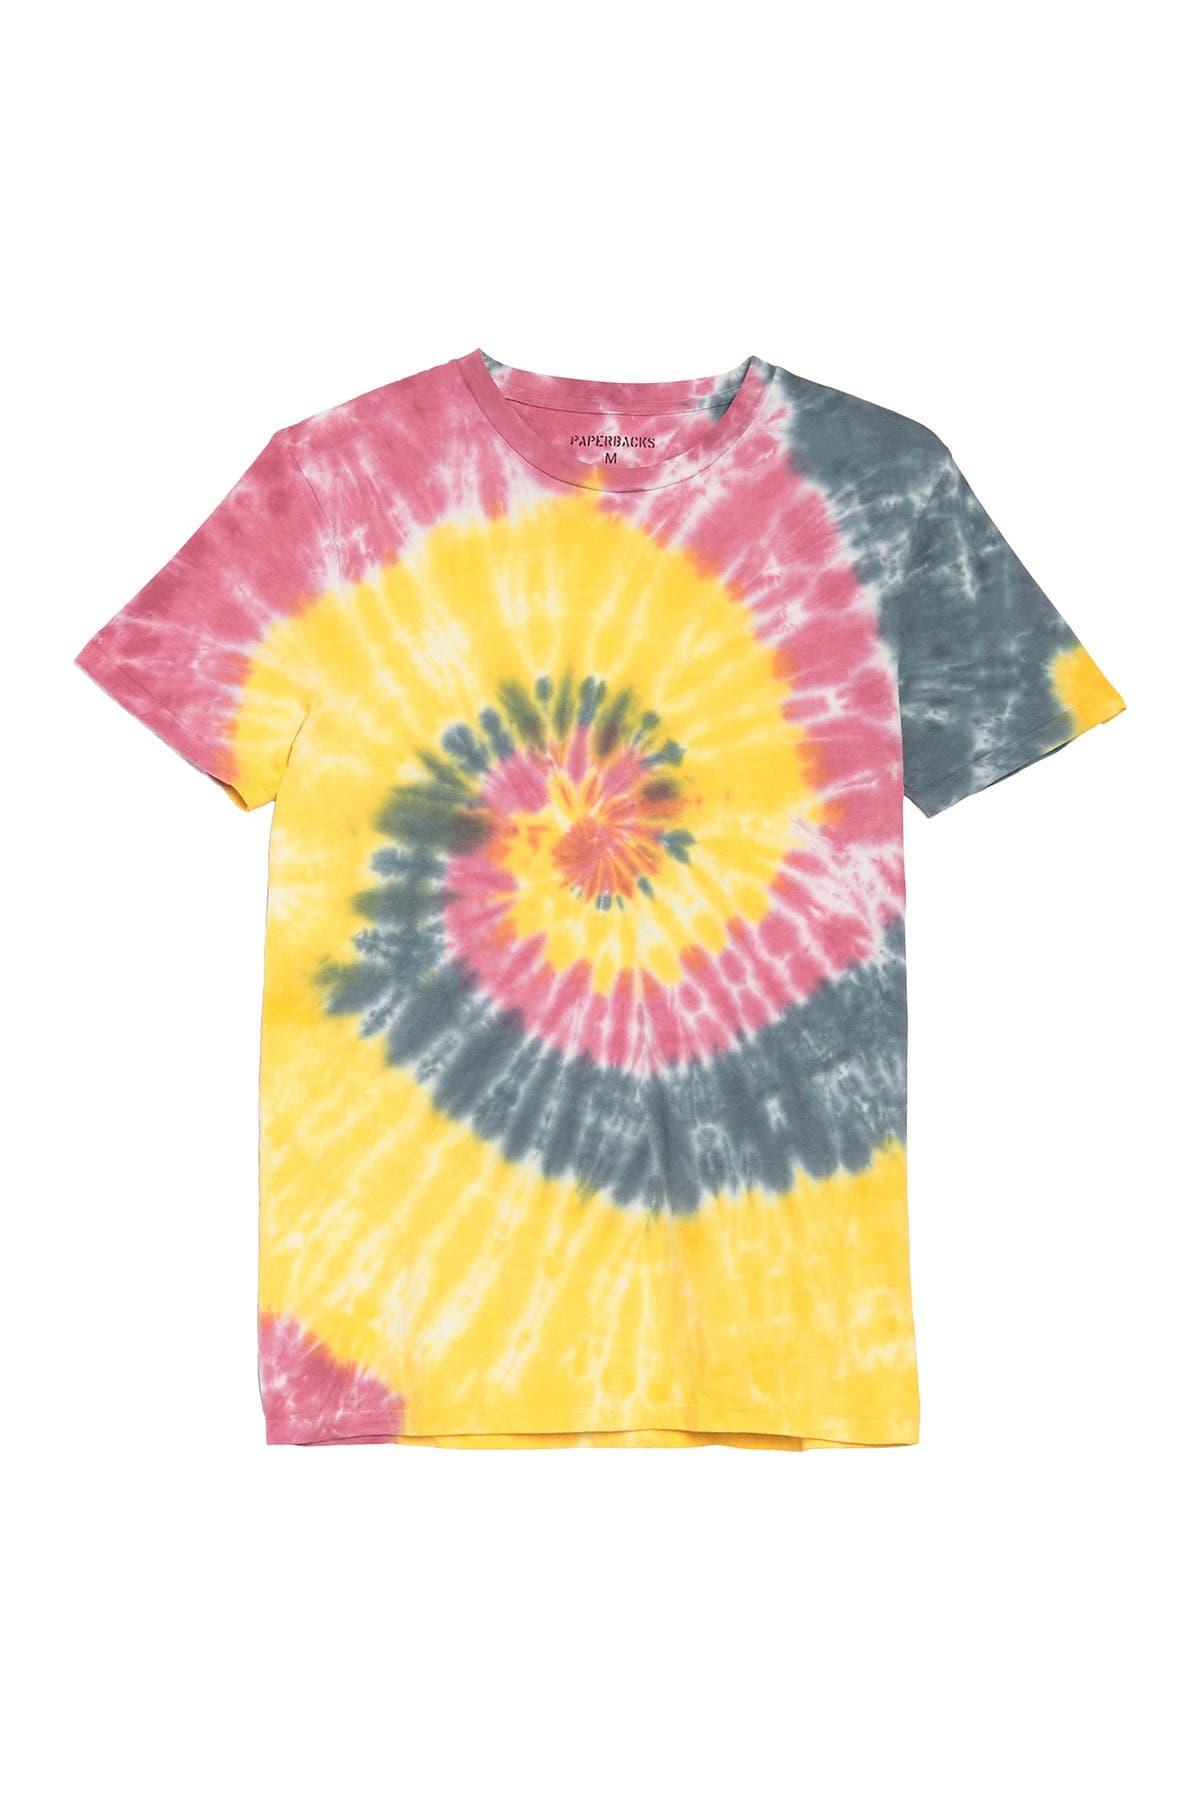 Image of Original Paperbacks South Sea Spiral T-Shirt